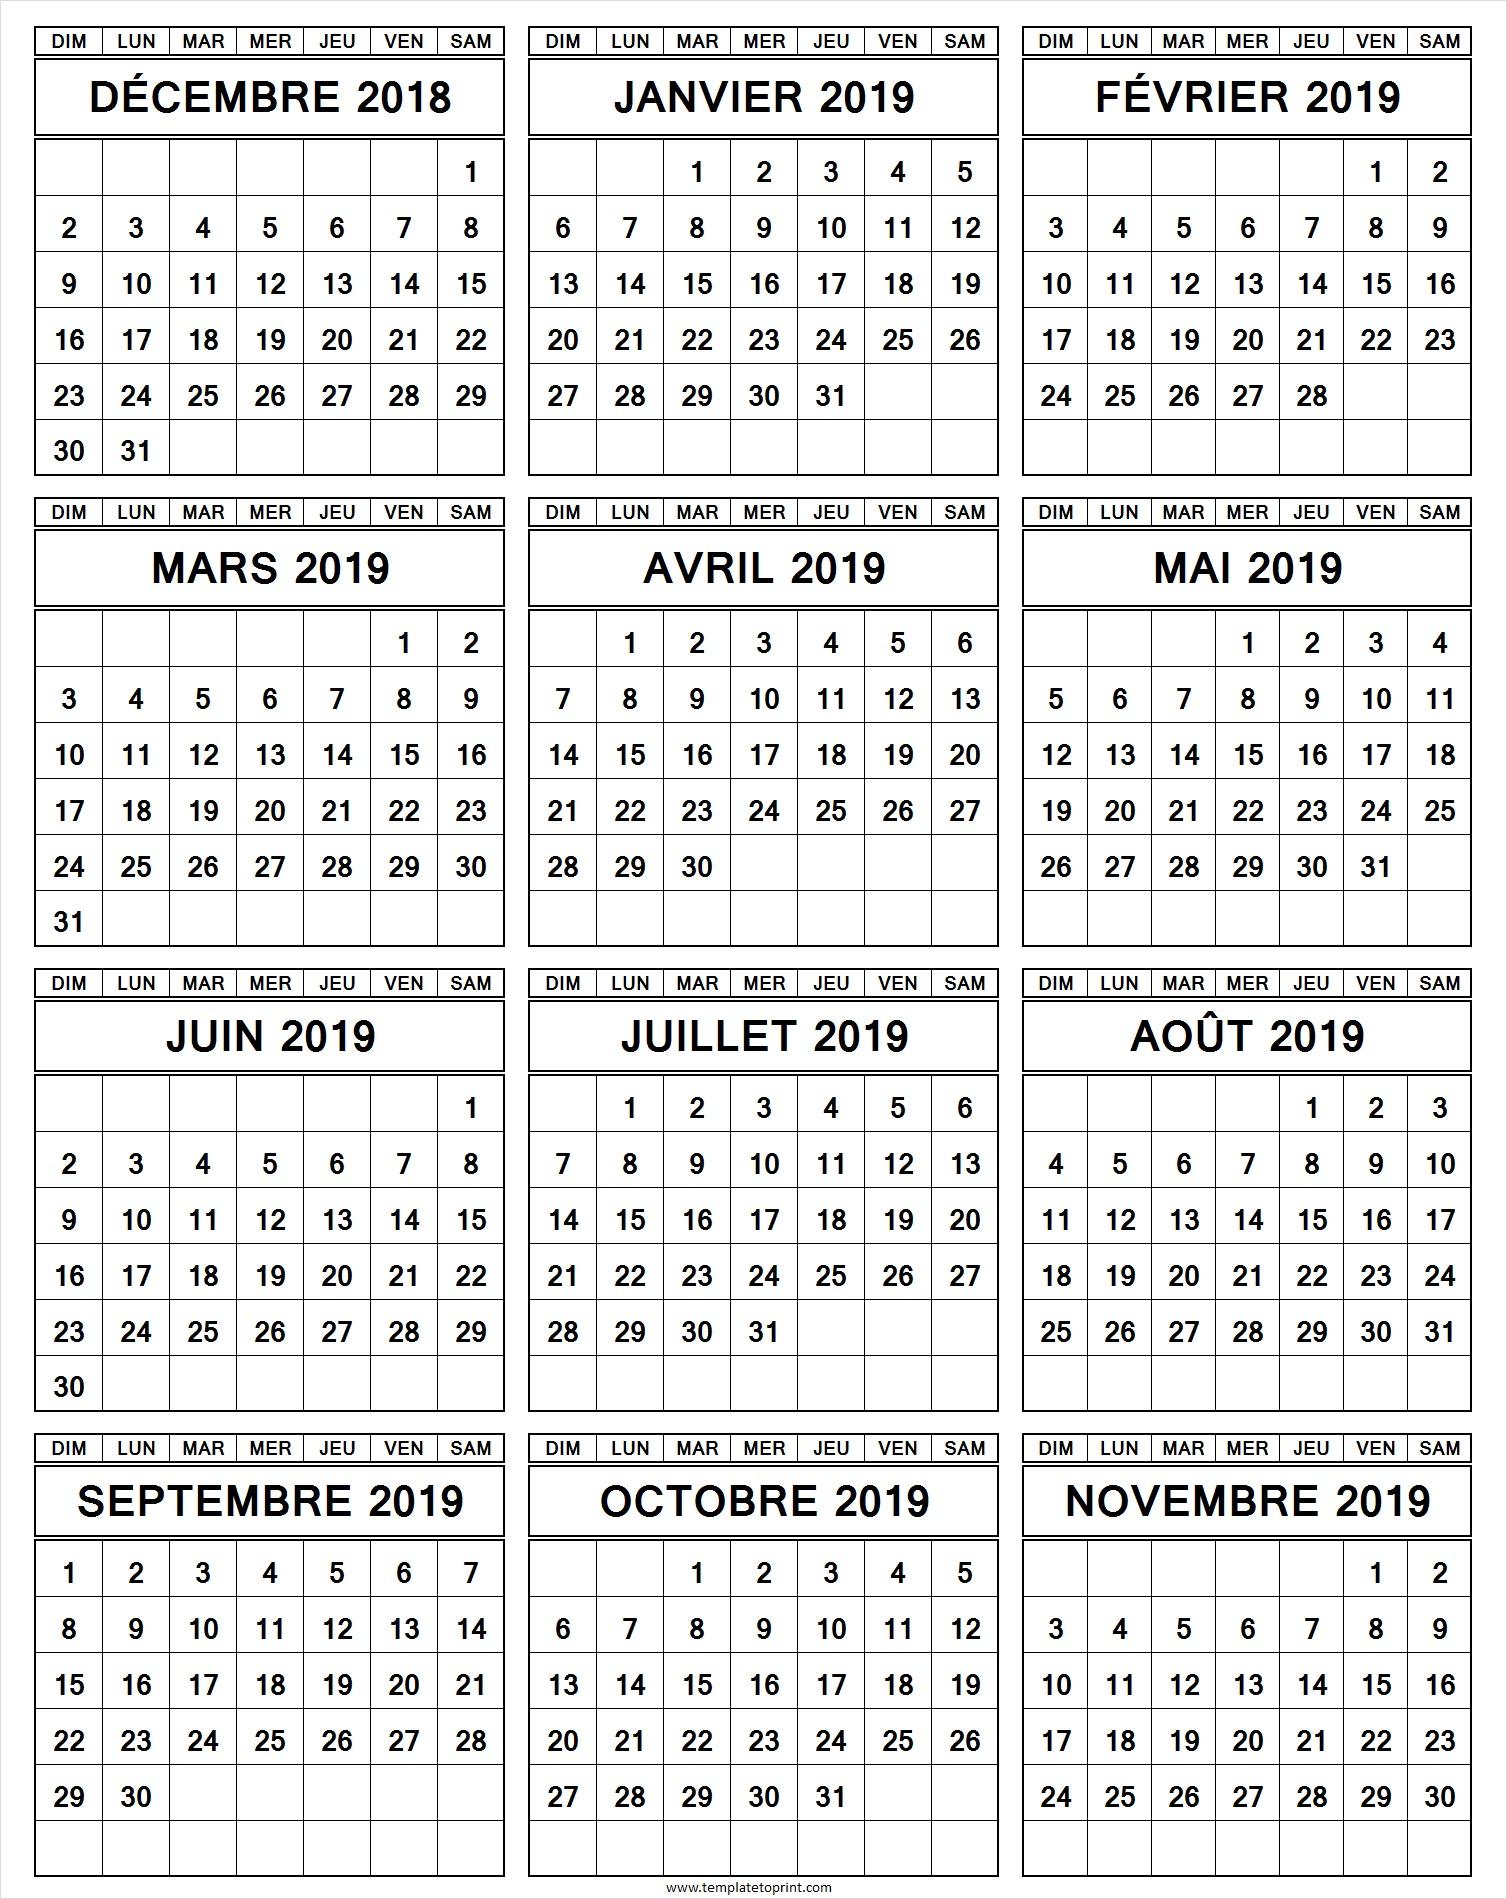 Calendrier Annuel Decembre 2018 A Novembre 2019 Imprimer destiné Calendrier Annuel 2018 À Imprimer